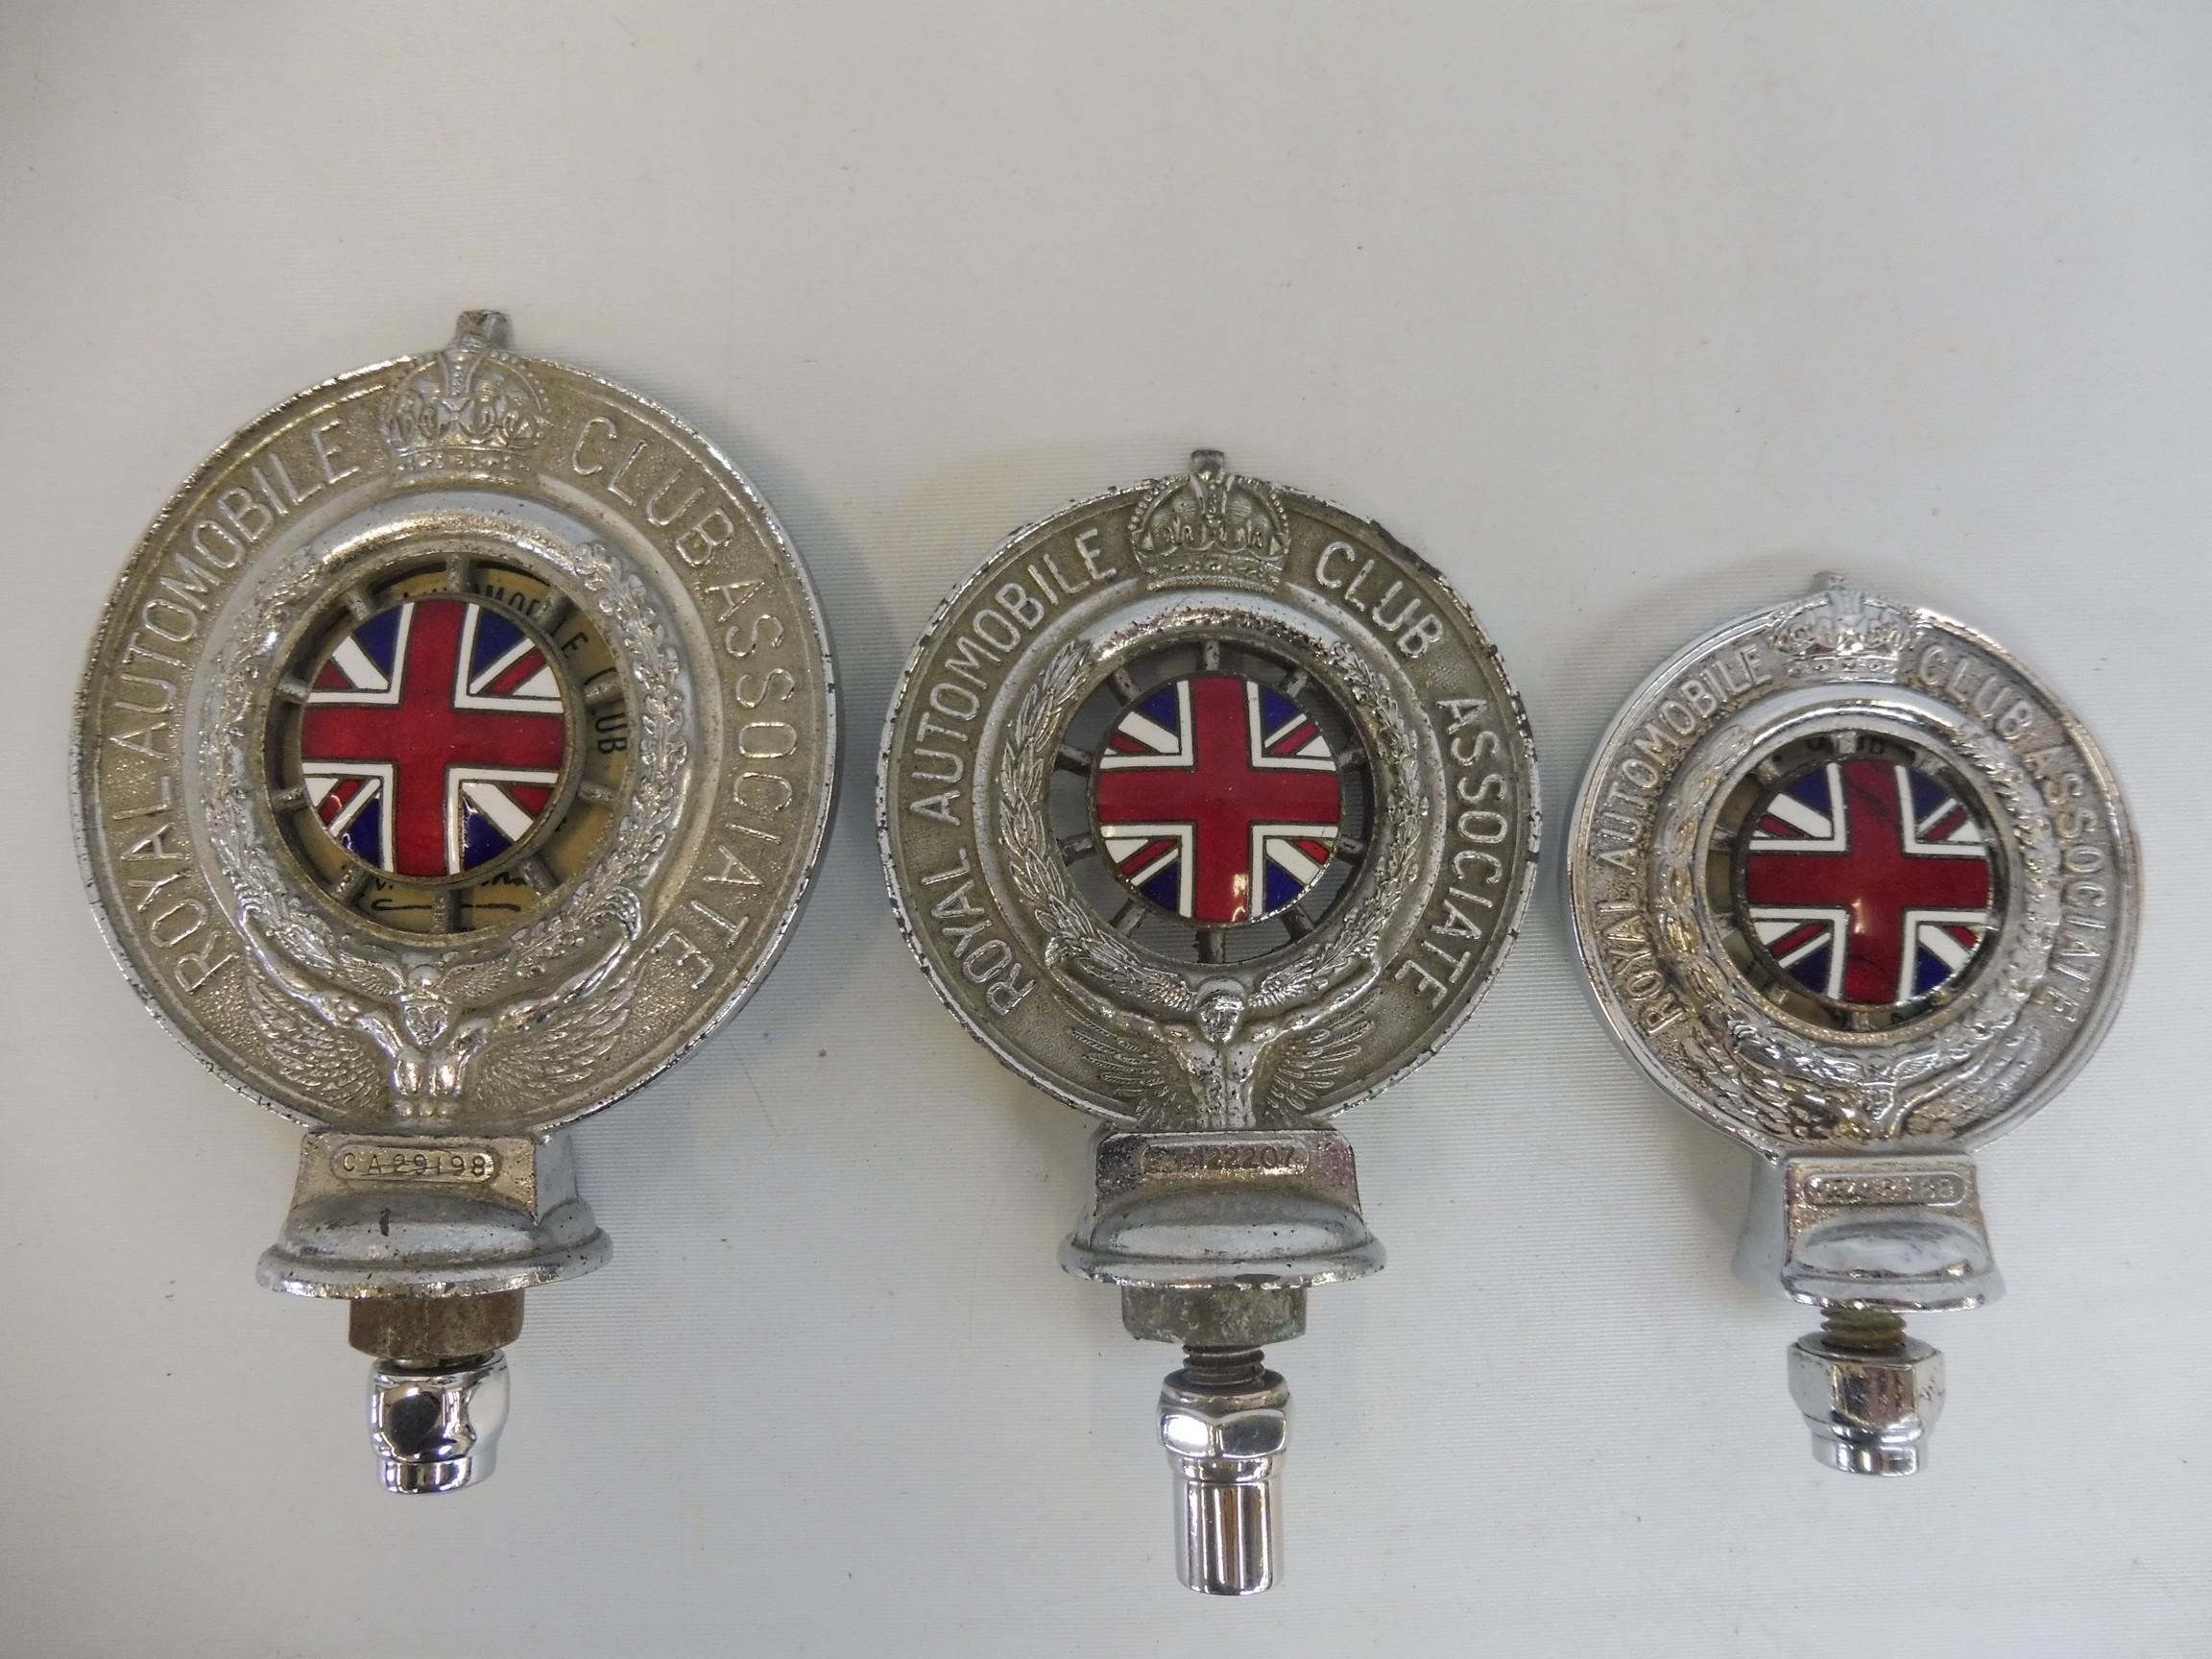 A graduated set of three Royal Automobile Associate car badges, all mazak metal with good enamel